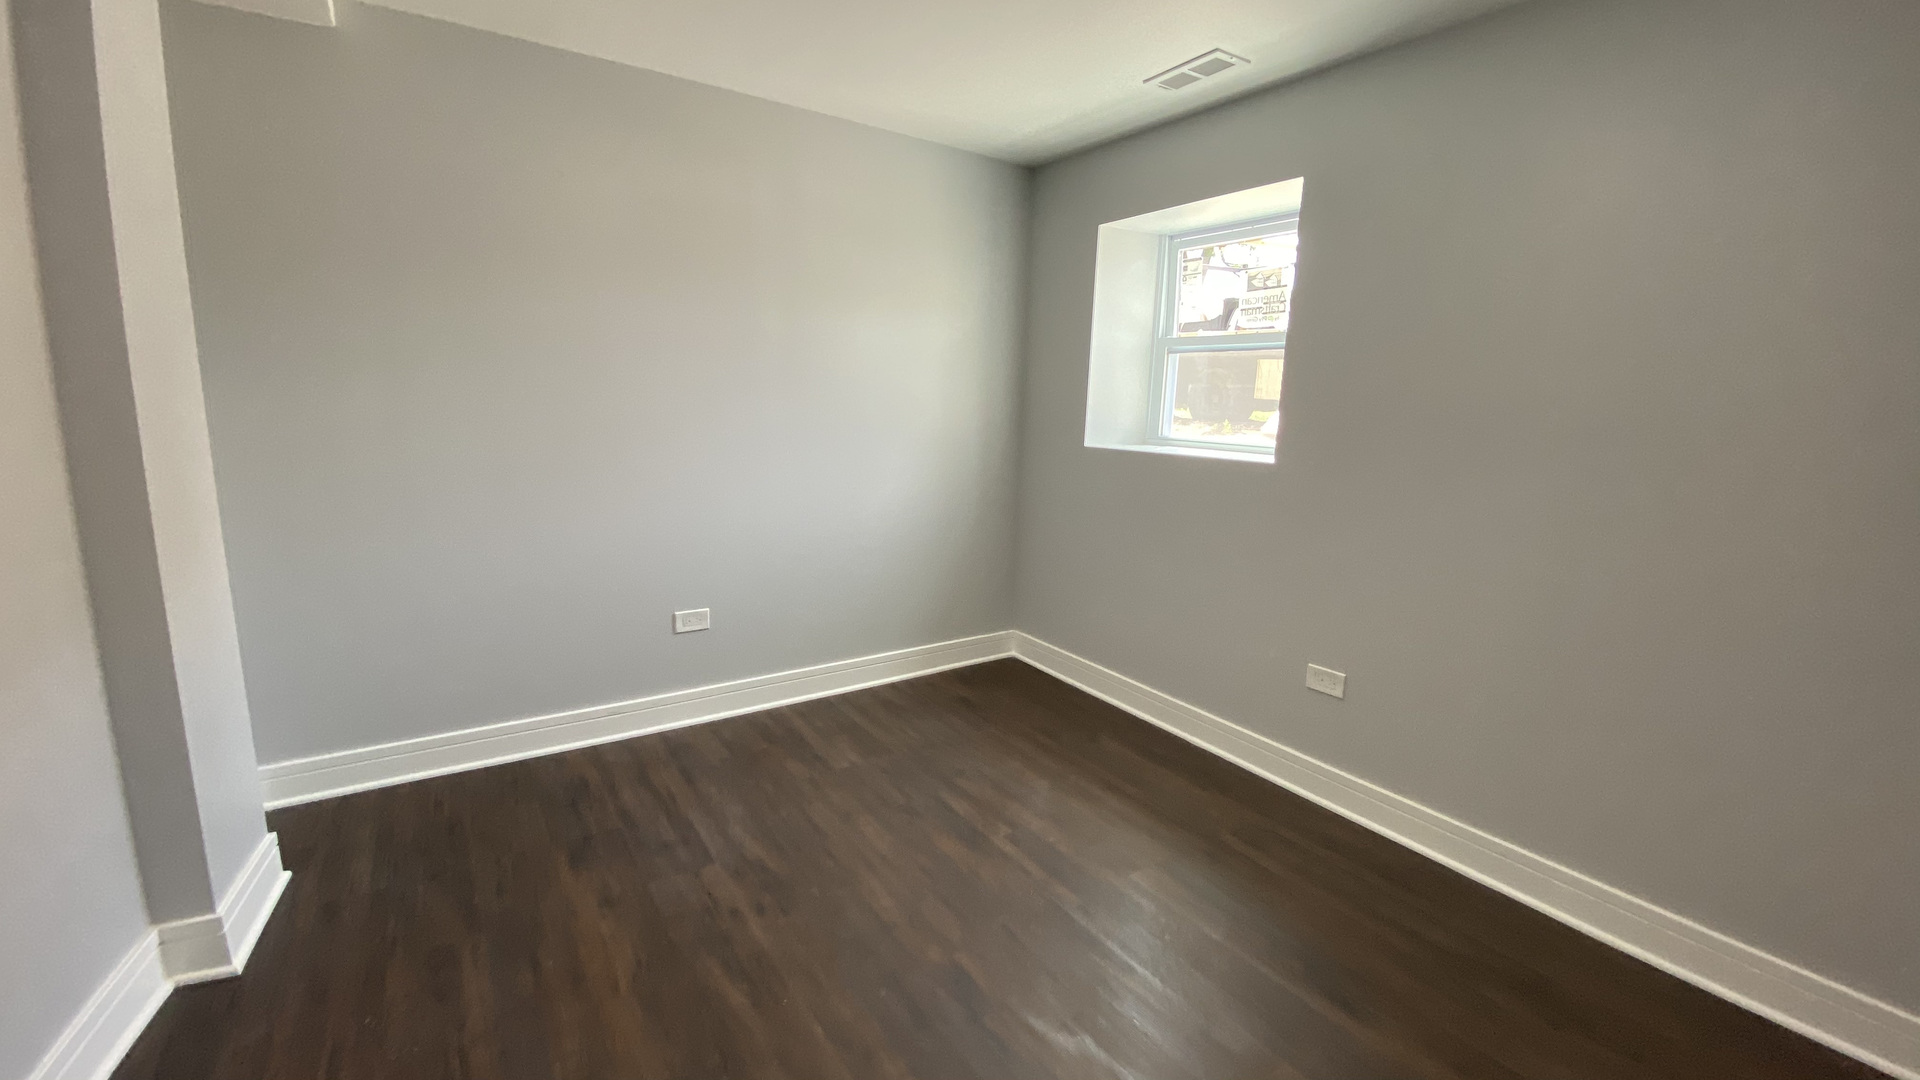 1014 N Harding Ave apartments for rent at AptAmigo